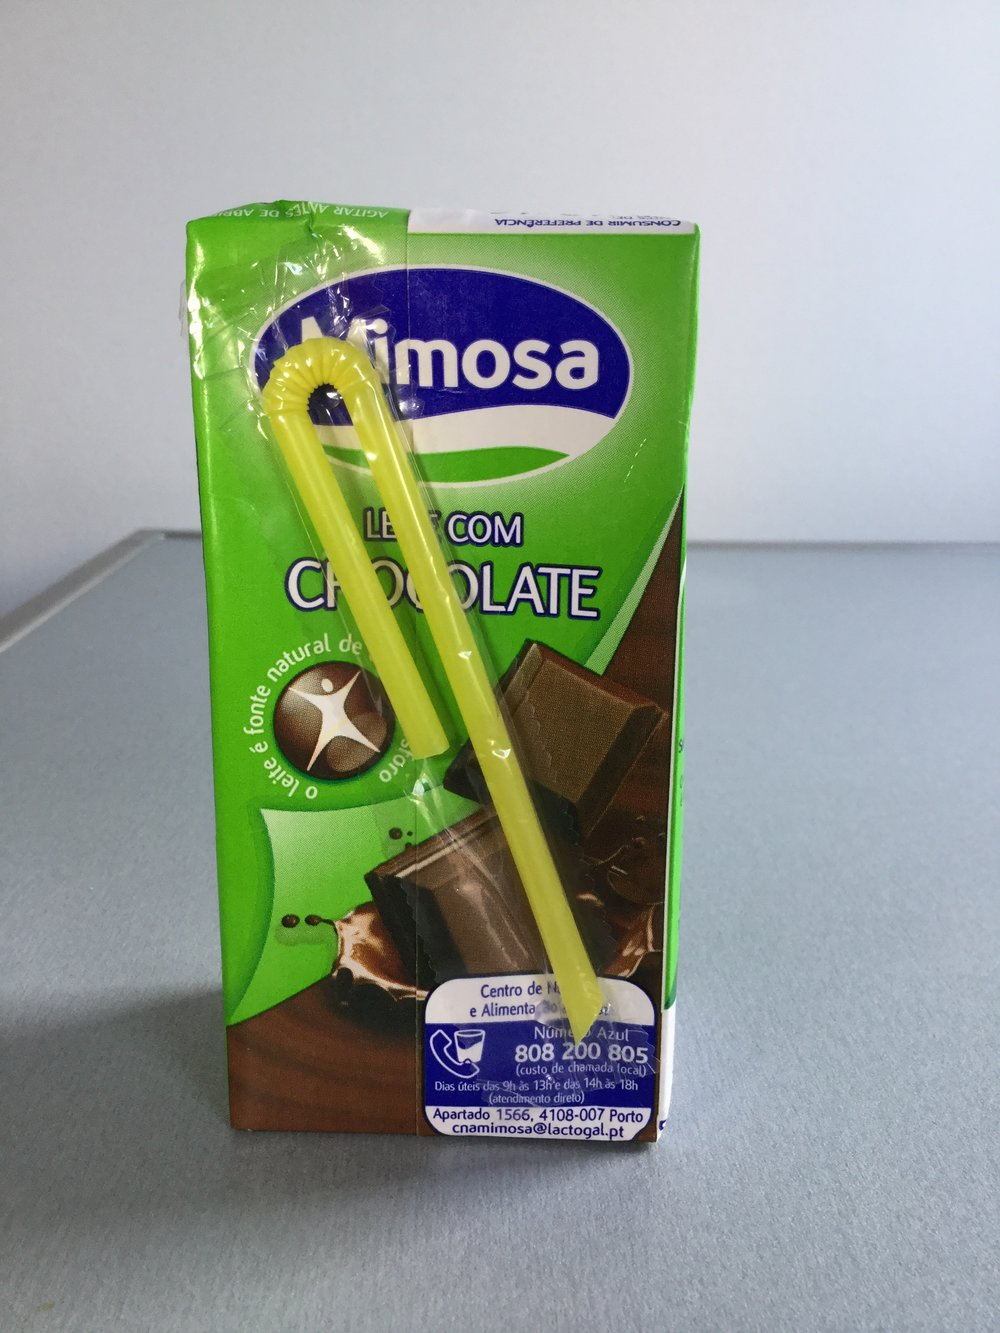 Mimosa Leite Com Chocolate Side 3